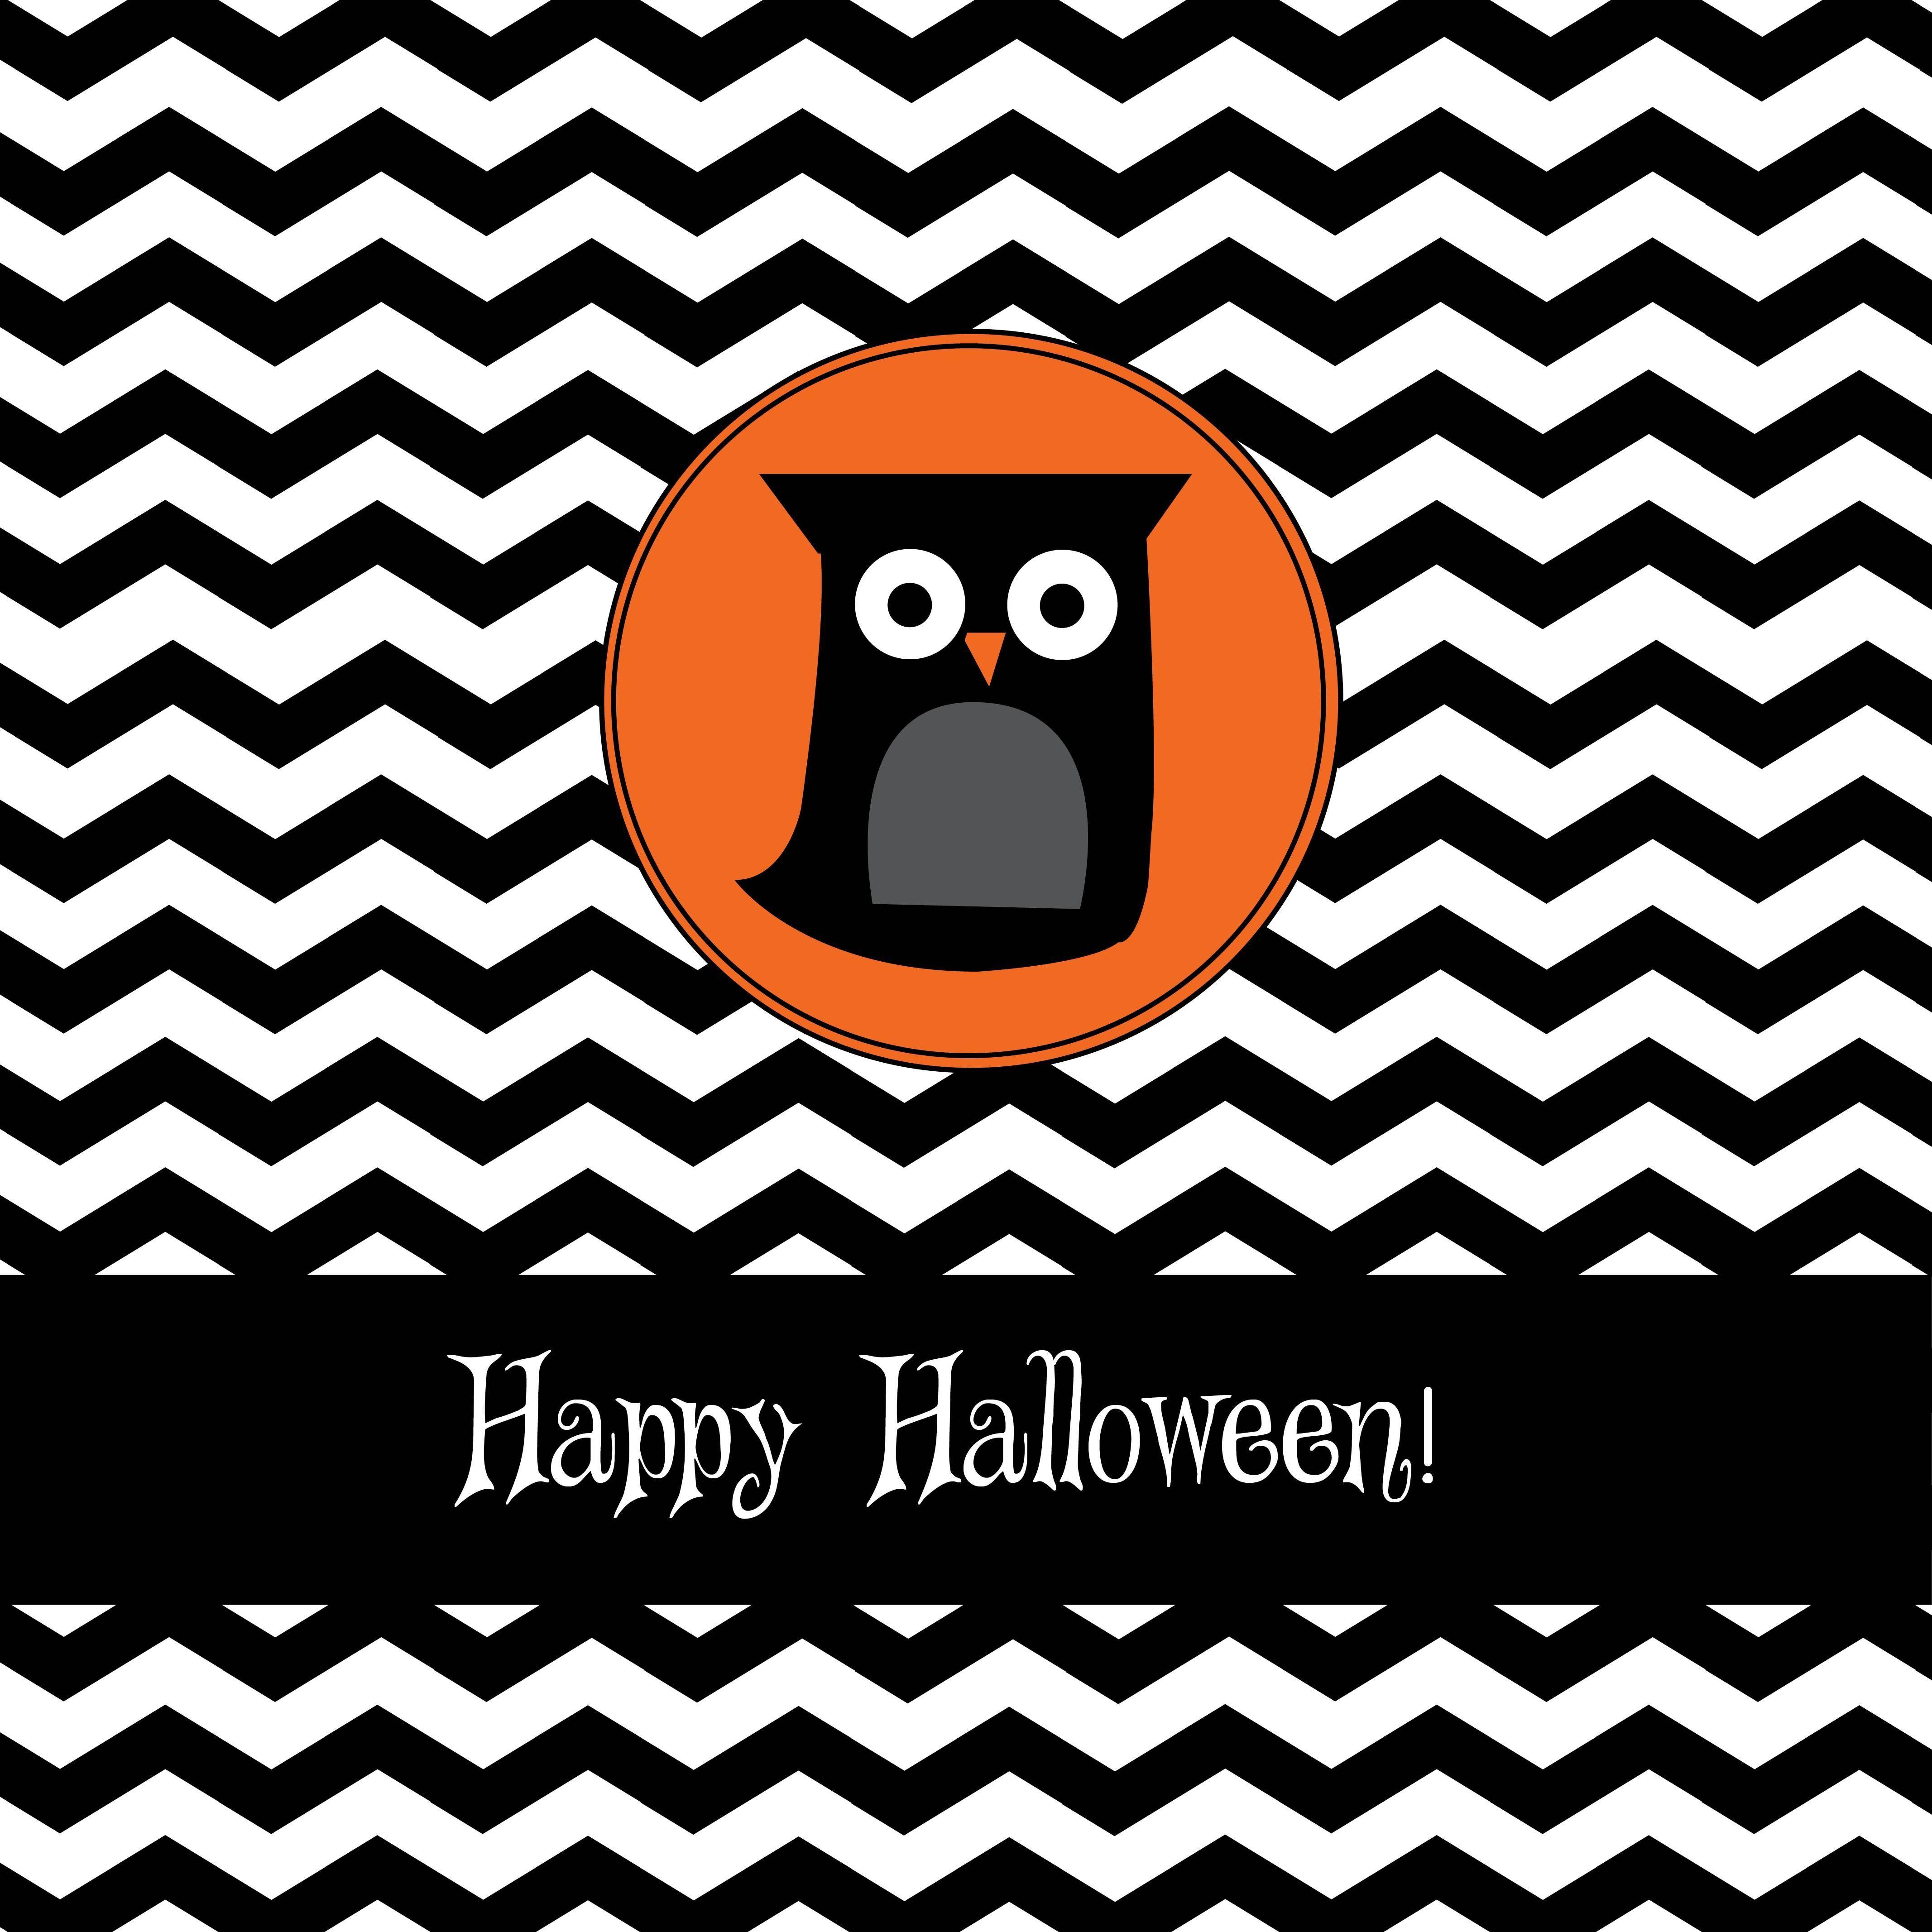 30 Cute Owl Halloween Wallpapers   Download at WallpaperBro 4267x4267